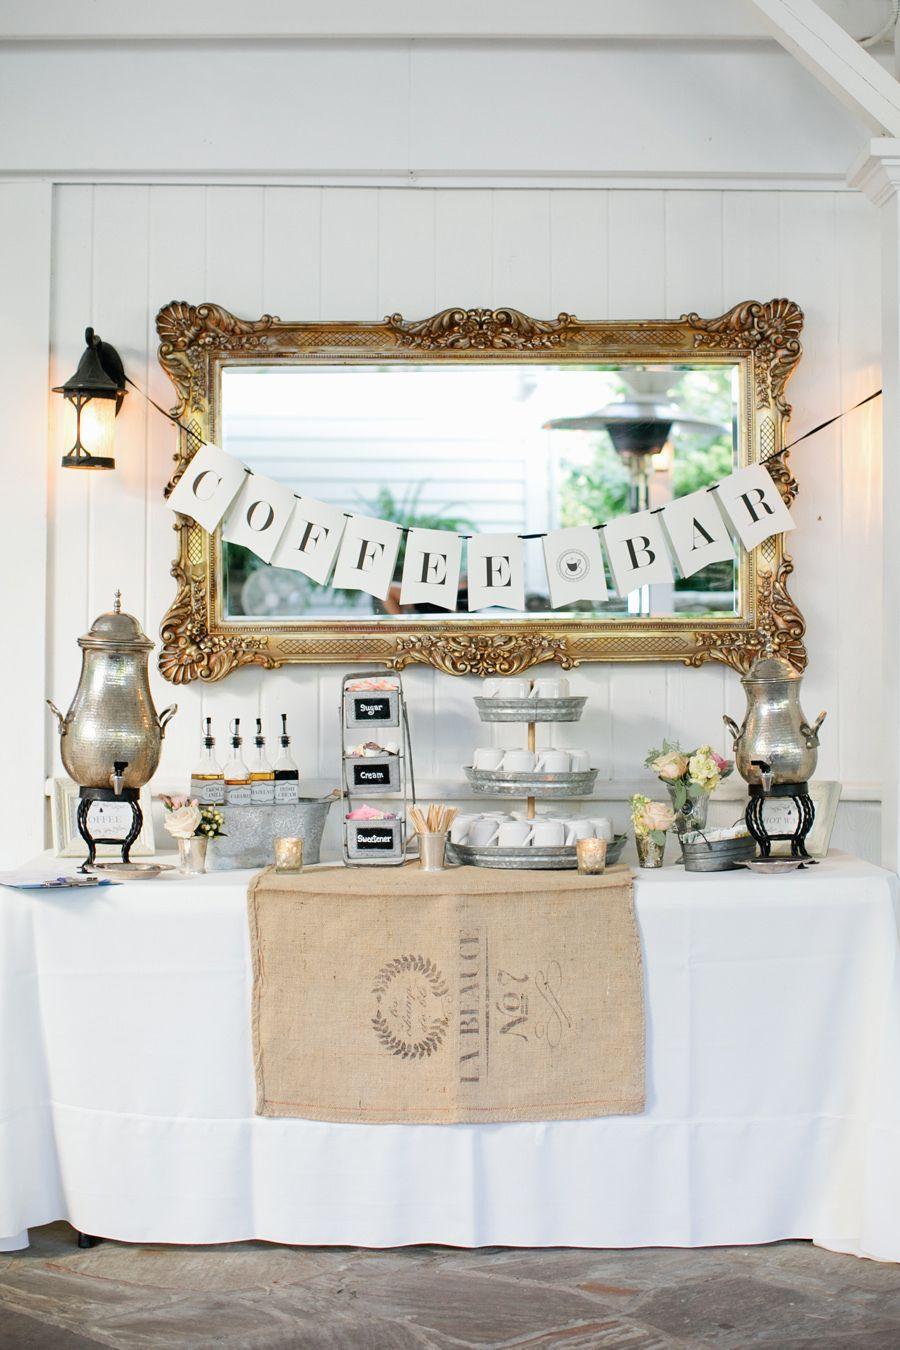 10 Ways to Add Coffee to Your Wedding | Themed weddings, Weddings ...